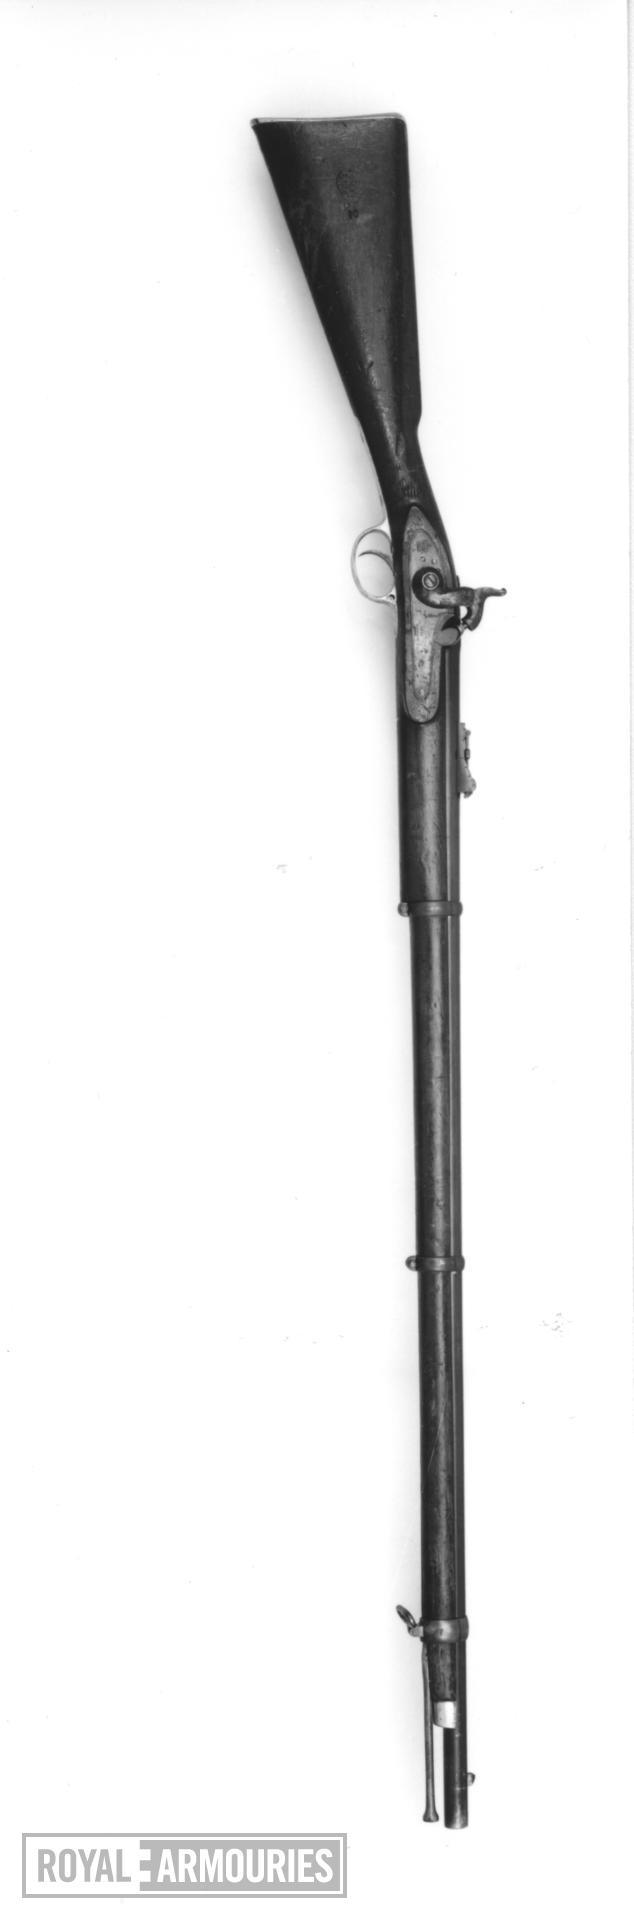 Percussion muzzle-loading military rifle-musket - Pattern 1853